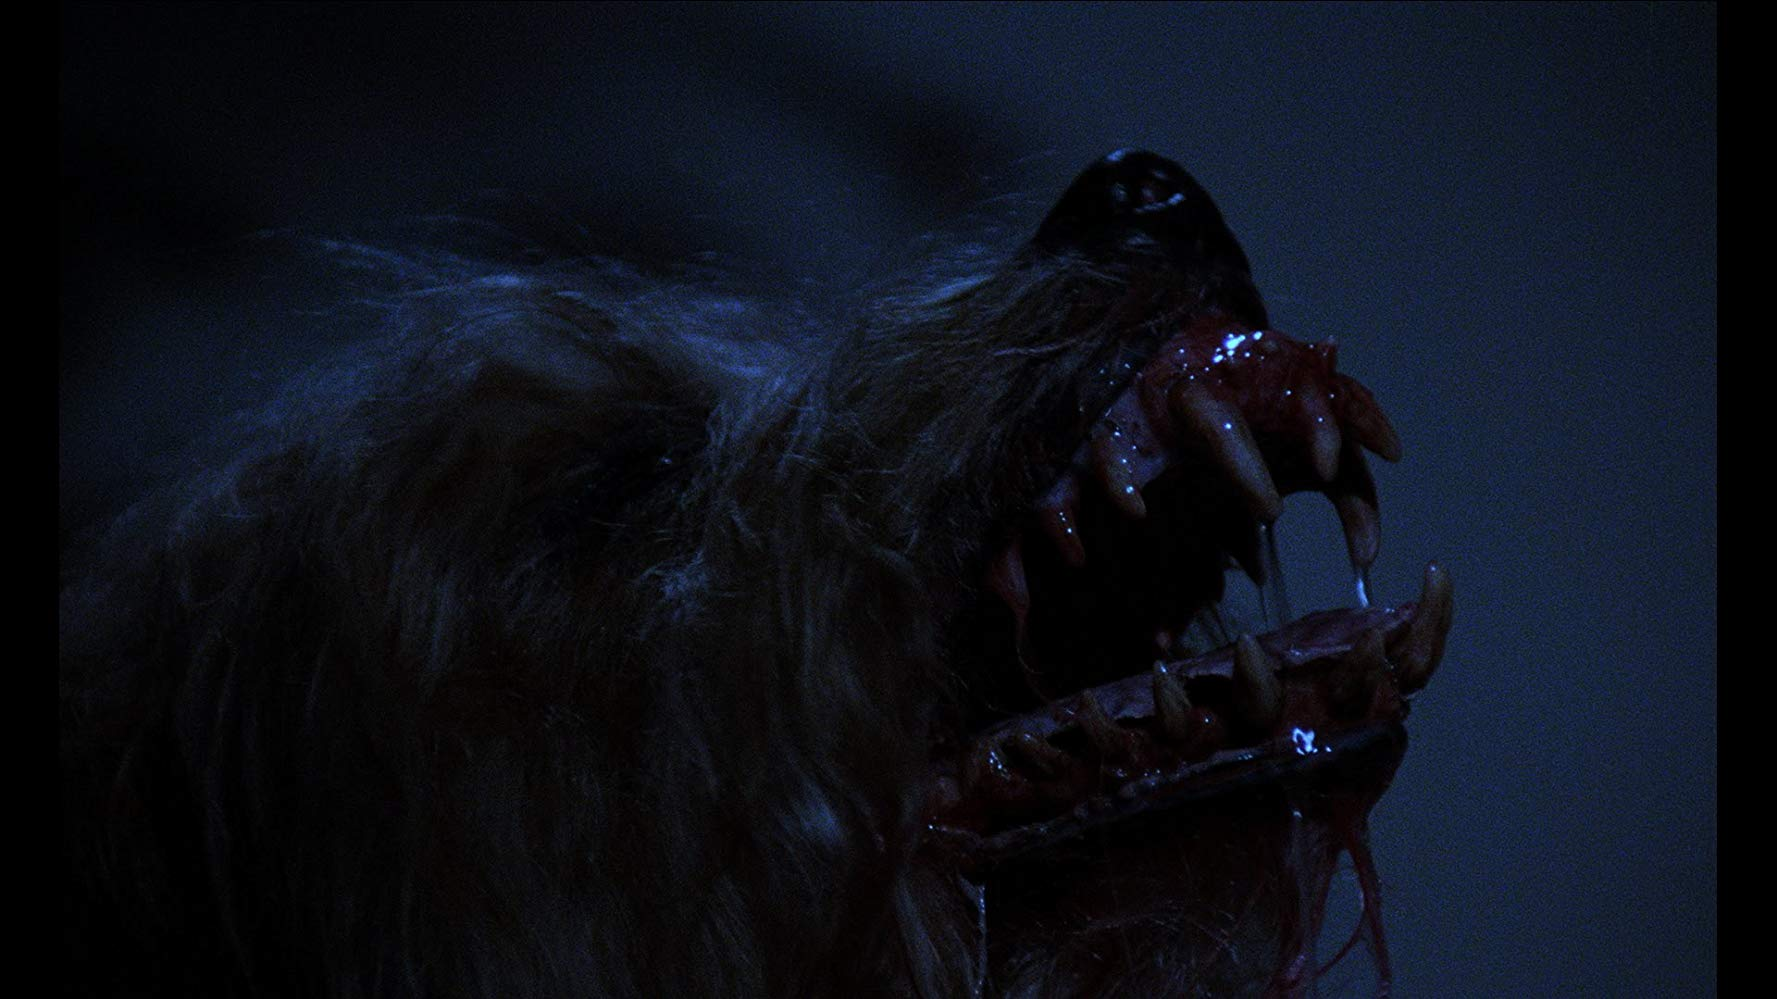 Démons 2 (1986)